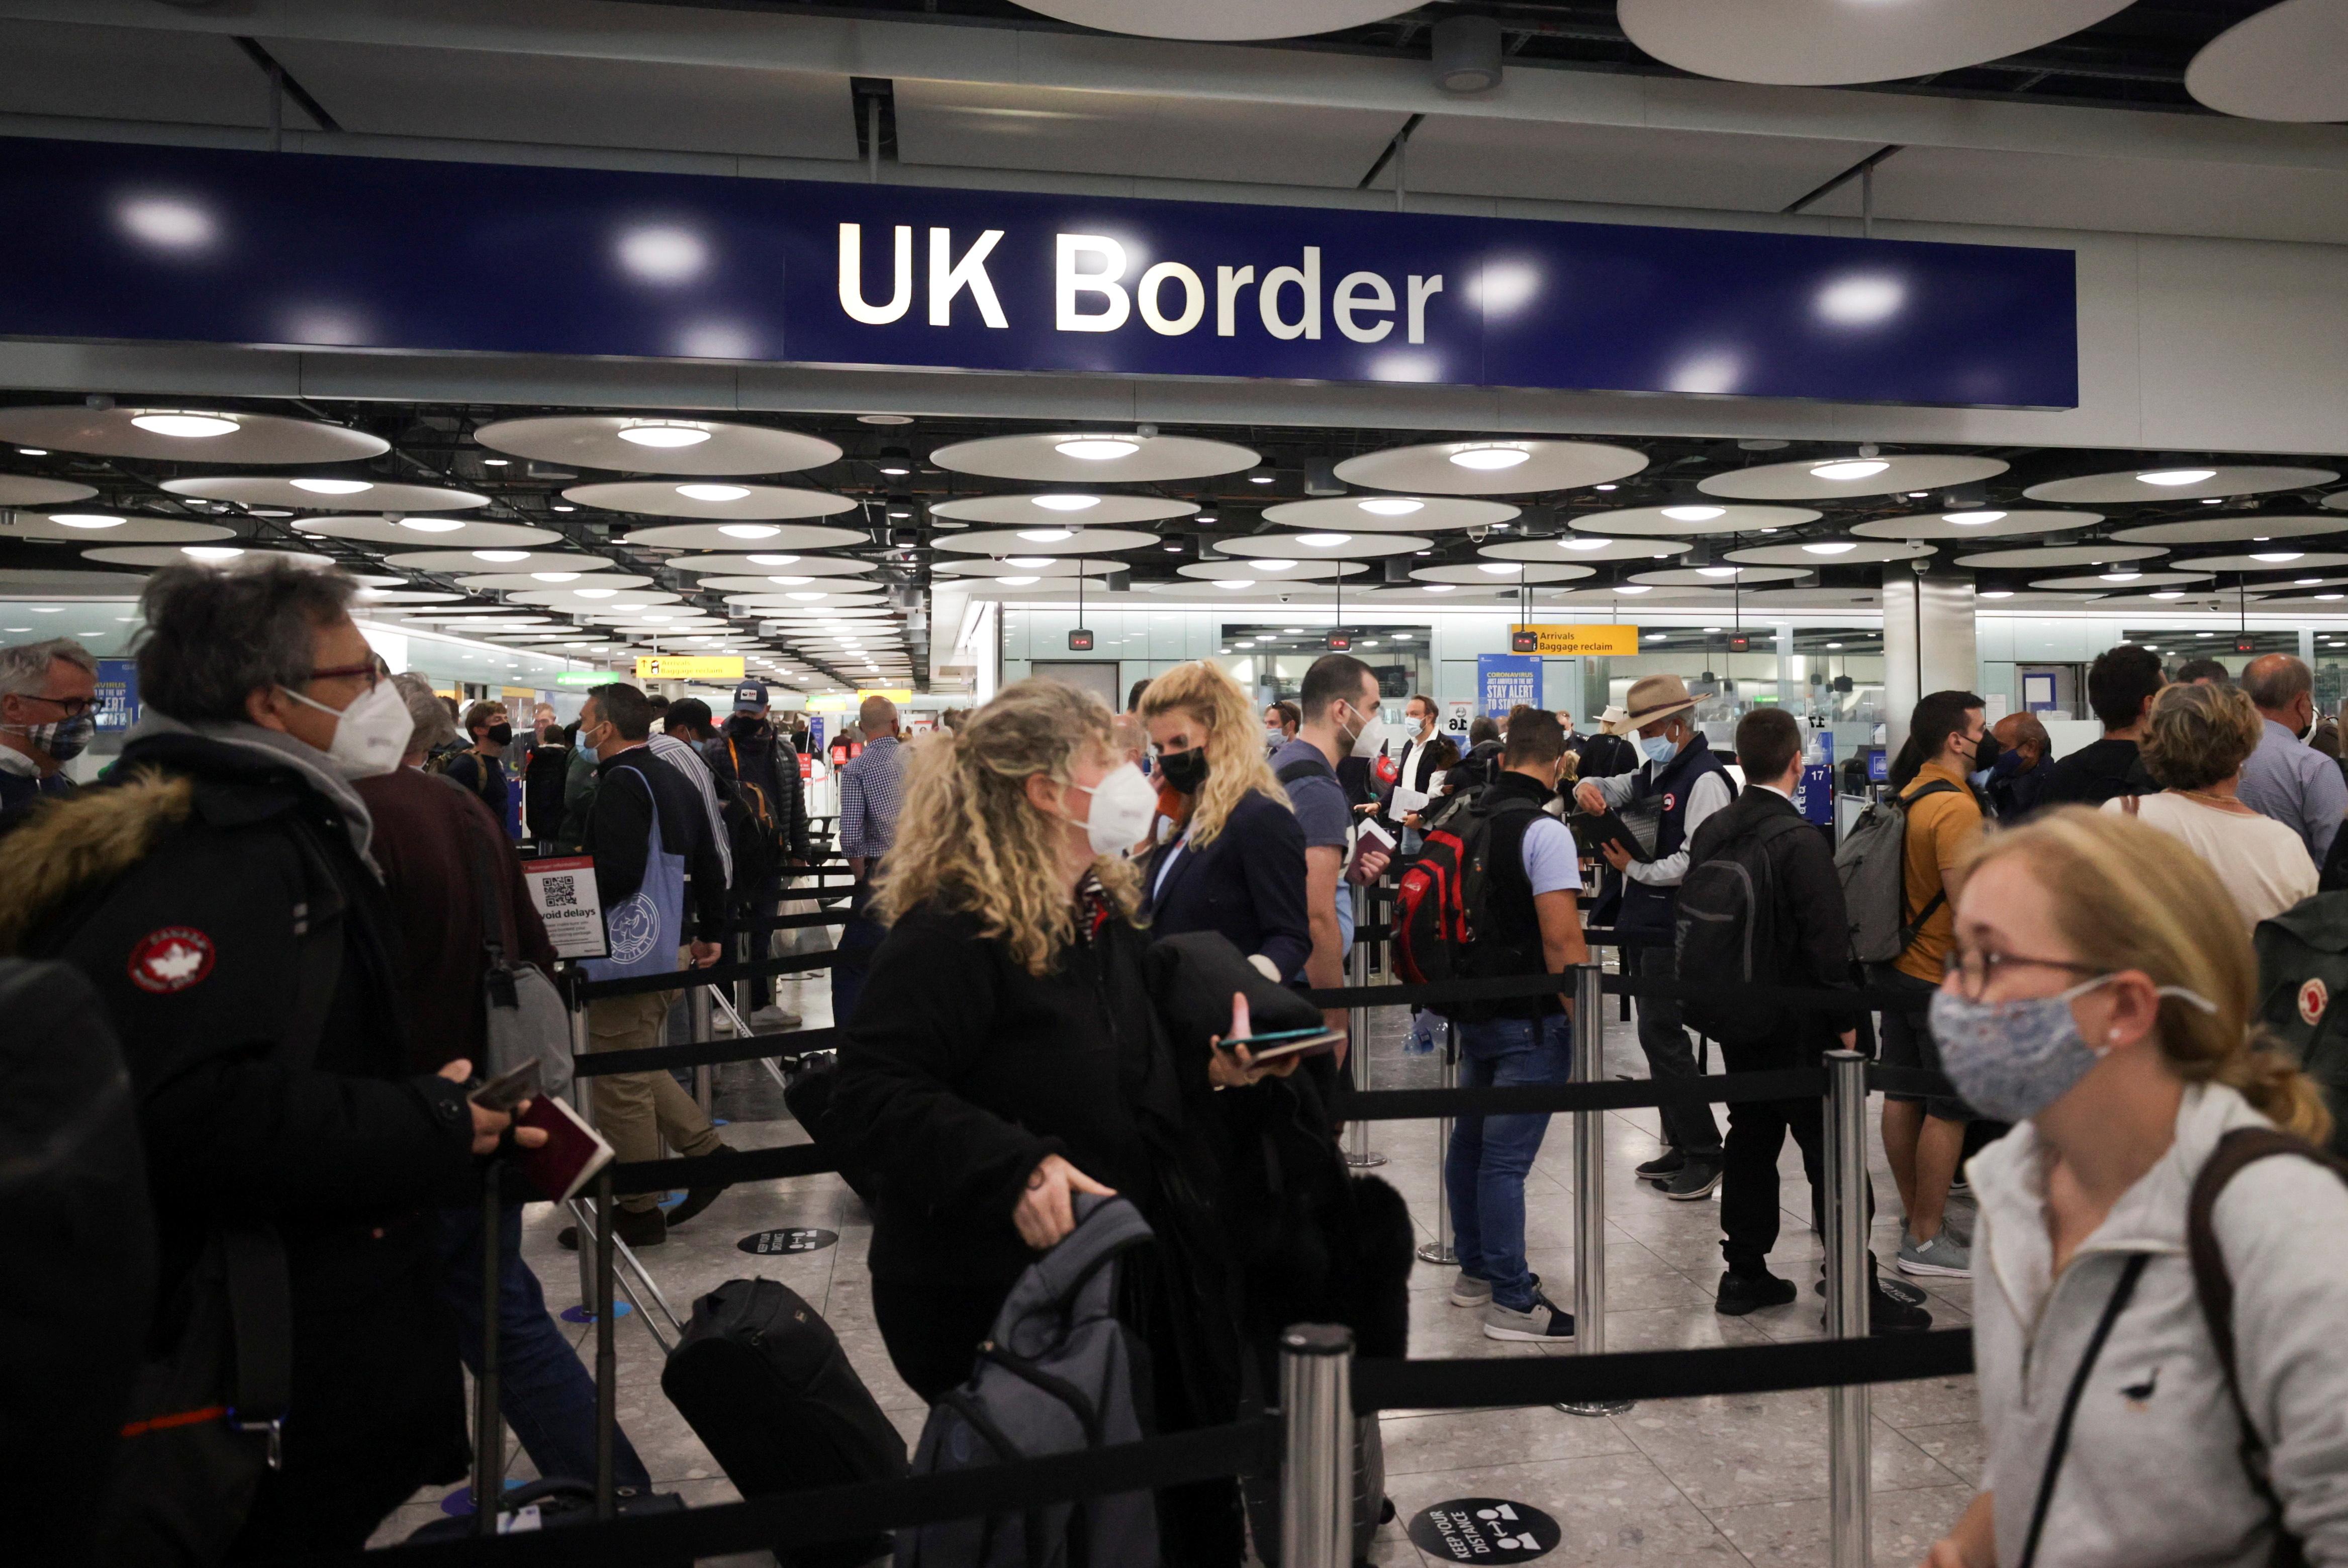 Arriving passengers queue at UK Border Control at the Terminal 5 at Heathrow Airport in London, Britain June 29, 2021. REUTERS/Hannah Mckay/File Photo